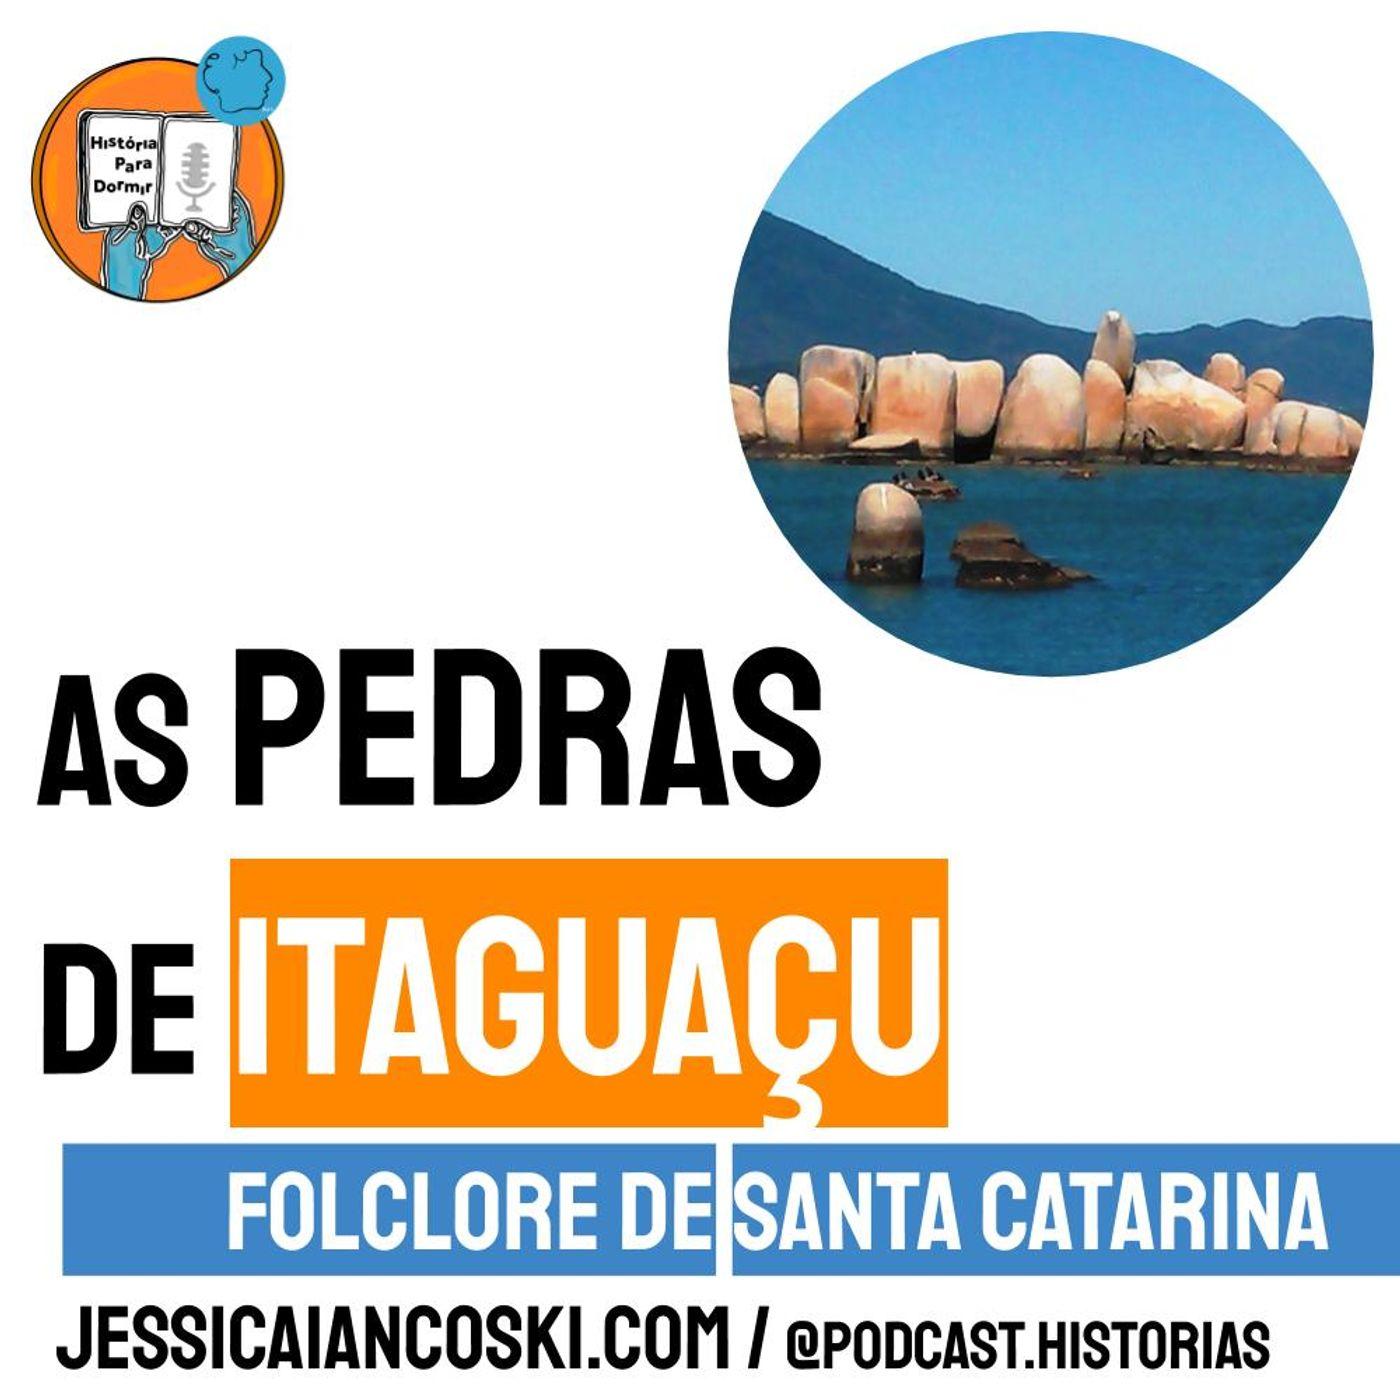 [T4 #9] As Pedras de Itaguaçu (ou Bruxas ) - Folclore de Santa Catarina | Historinha Infantil